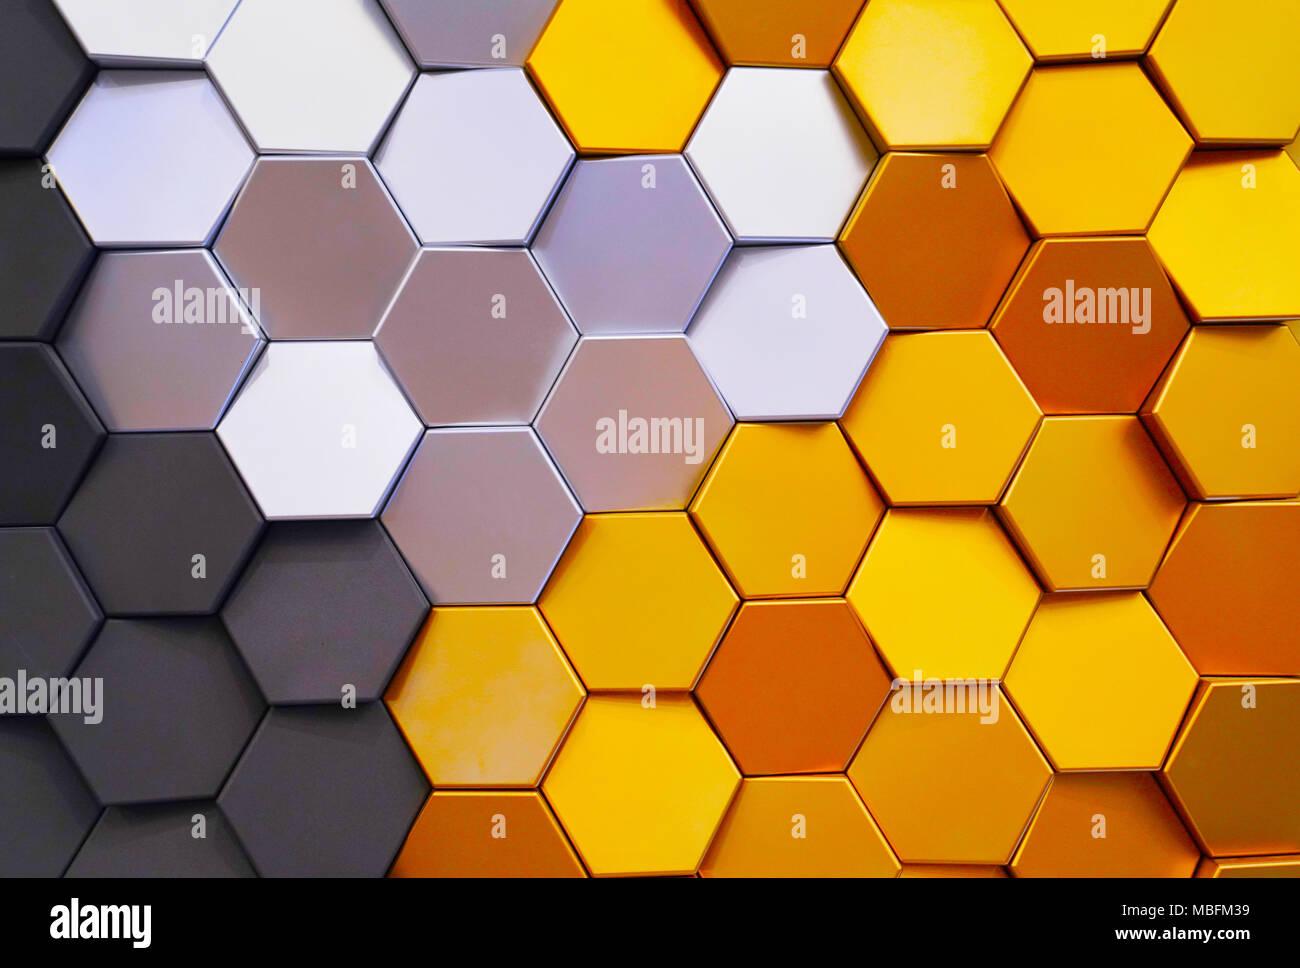 Piastrelle A Nido Dape : Forma a nido d ape decorative colorate piastrelle di ceramica